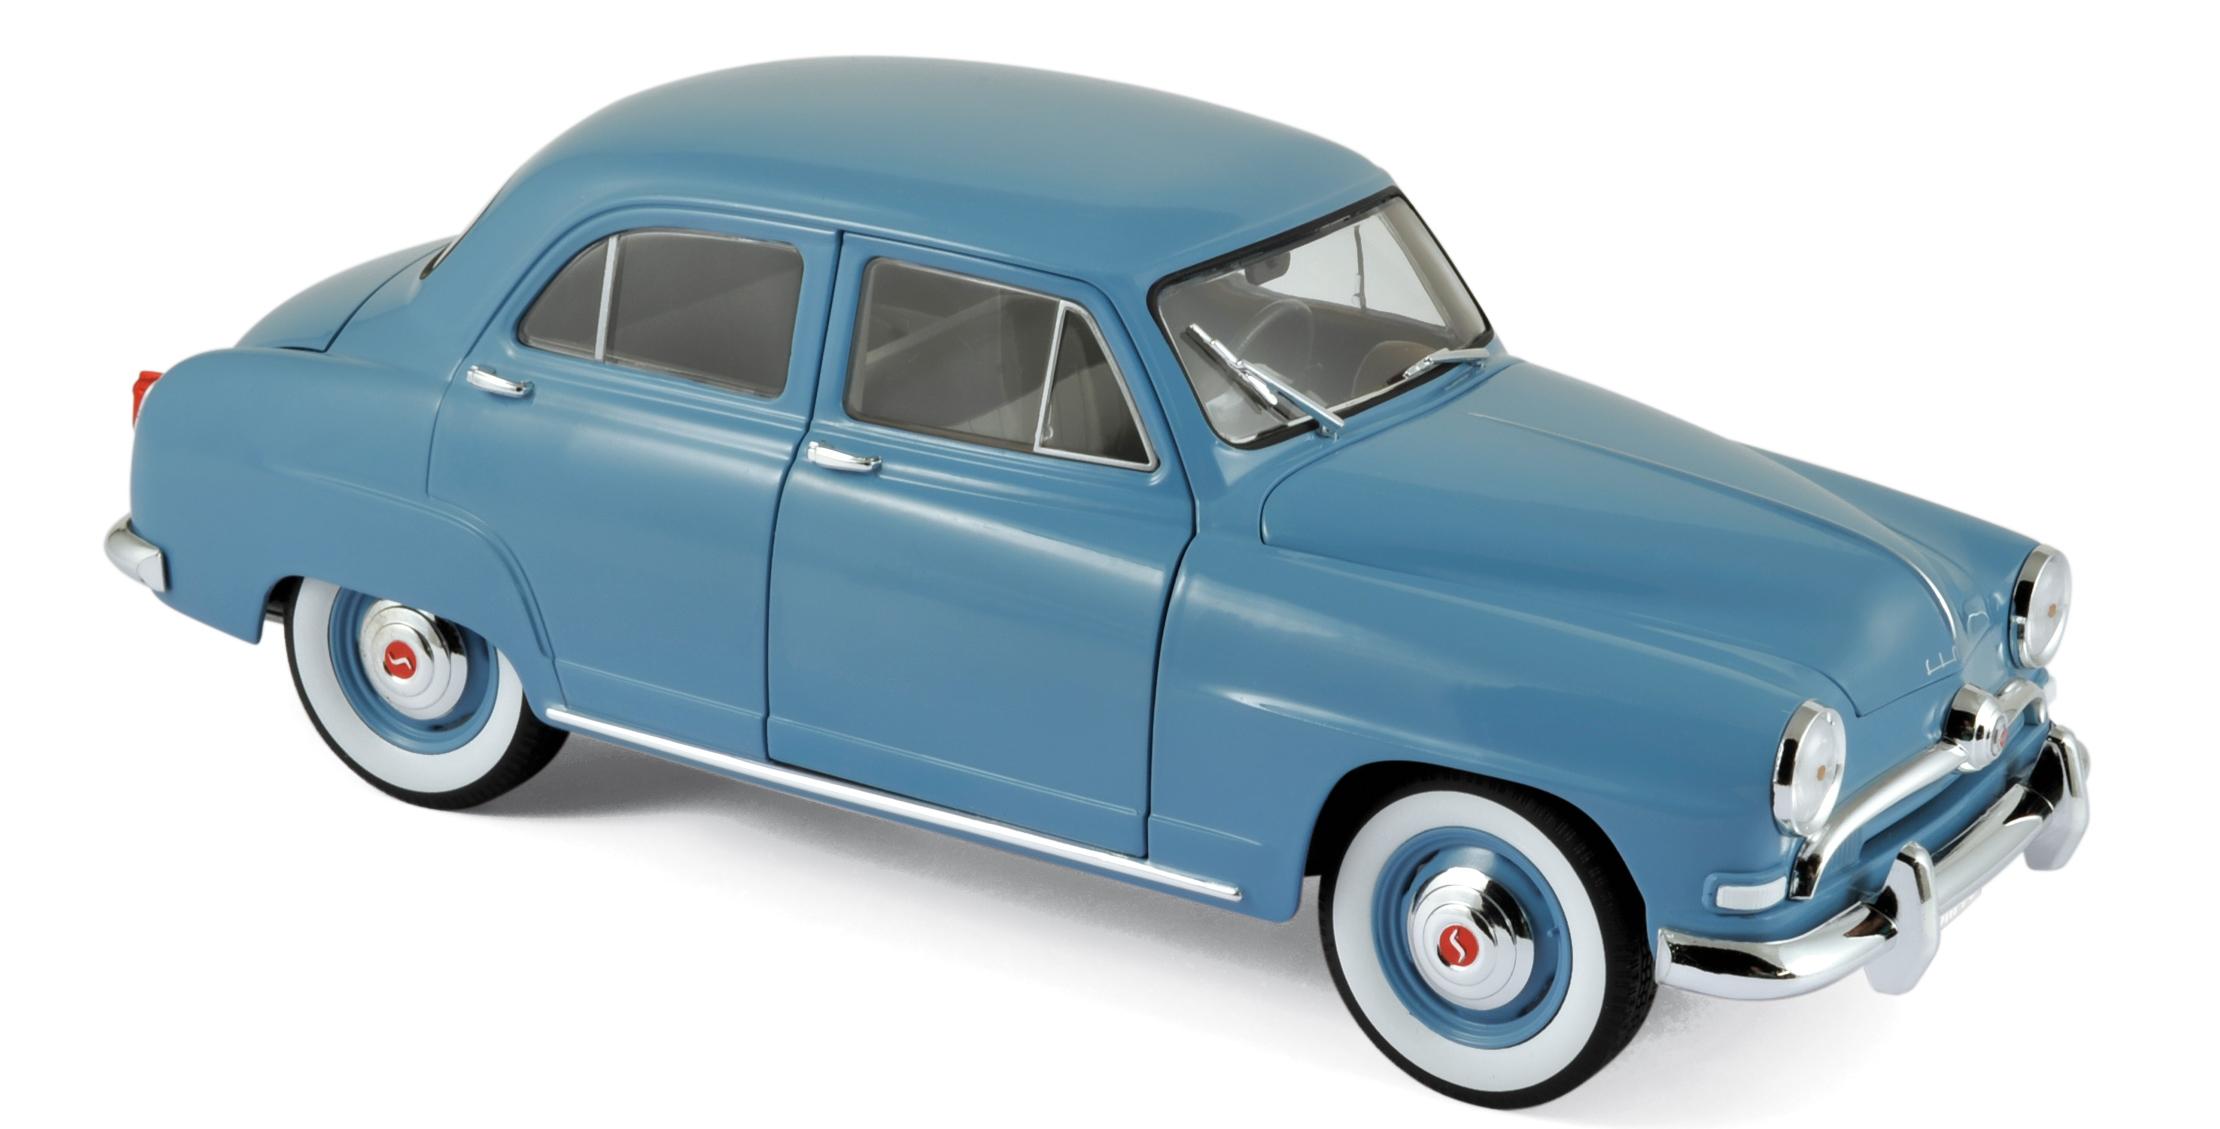 185741  Simca 9 Aronde 1954, lichtblauw, Norev